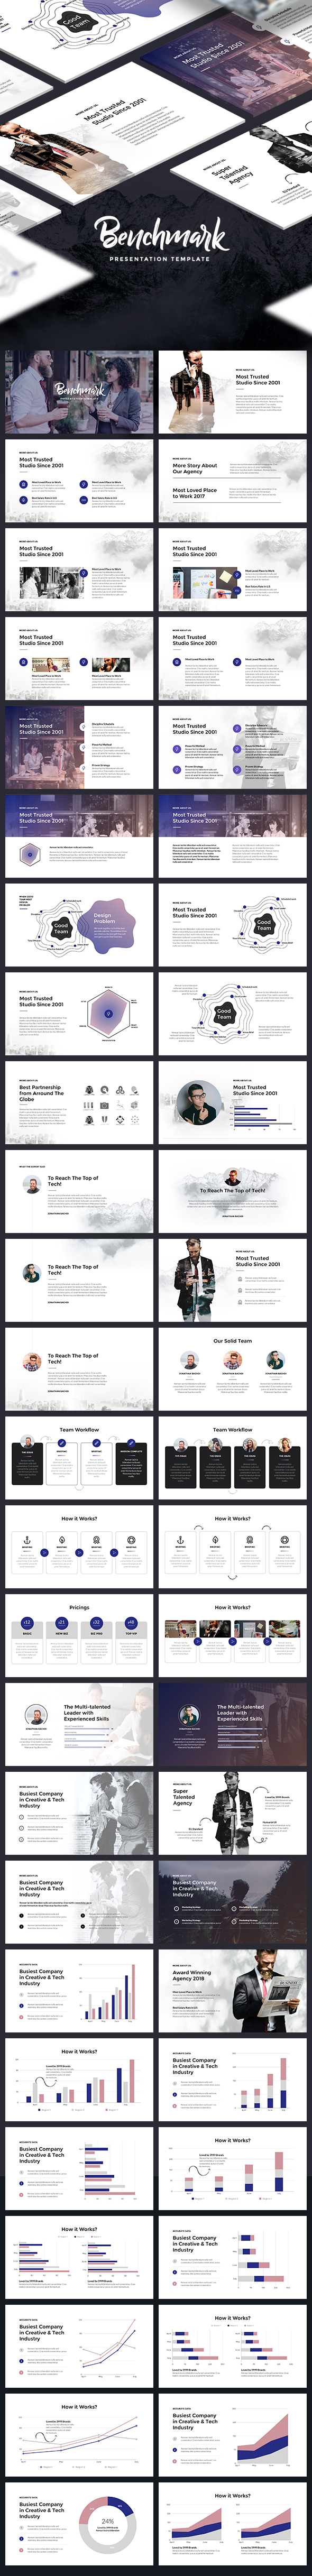 Benchmark - Modern Keynote Template - Keynote Templates Presentation Templates